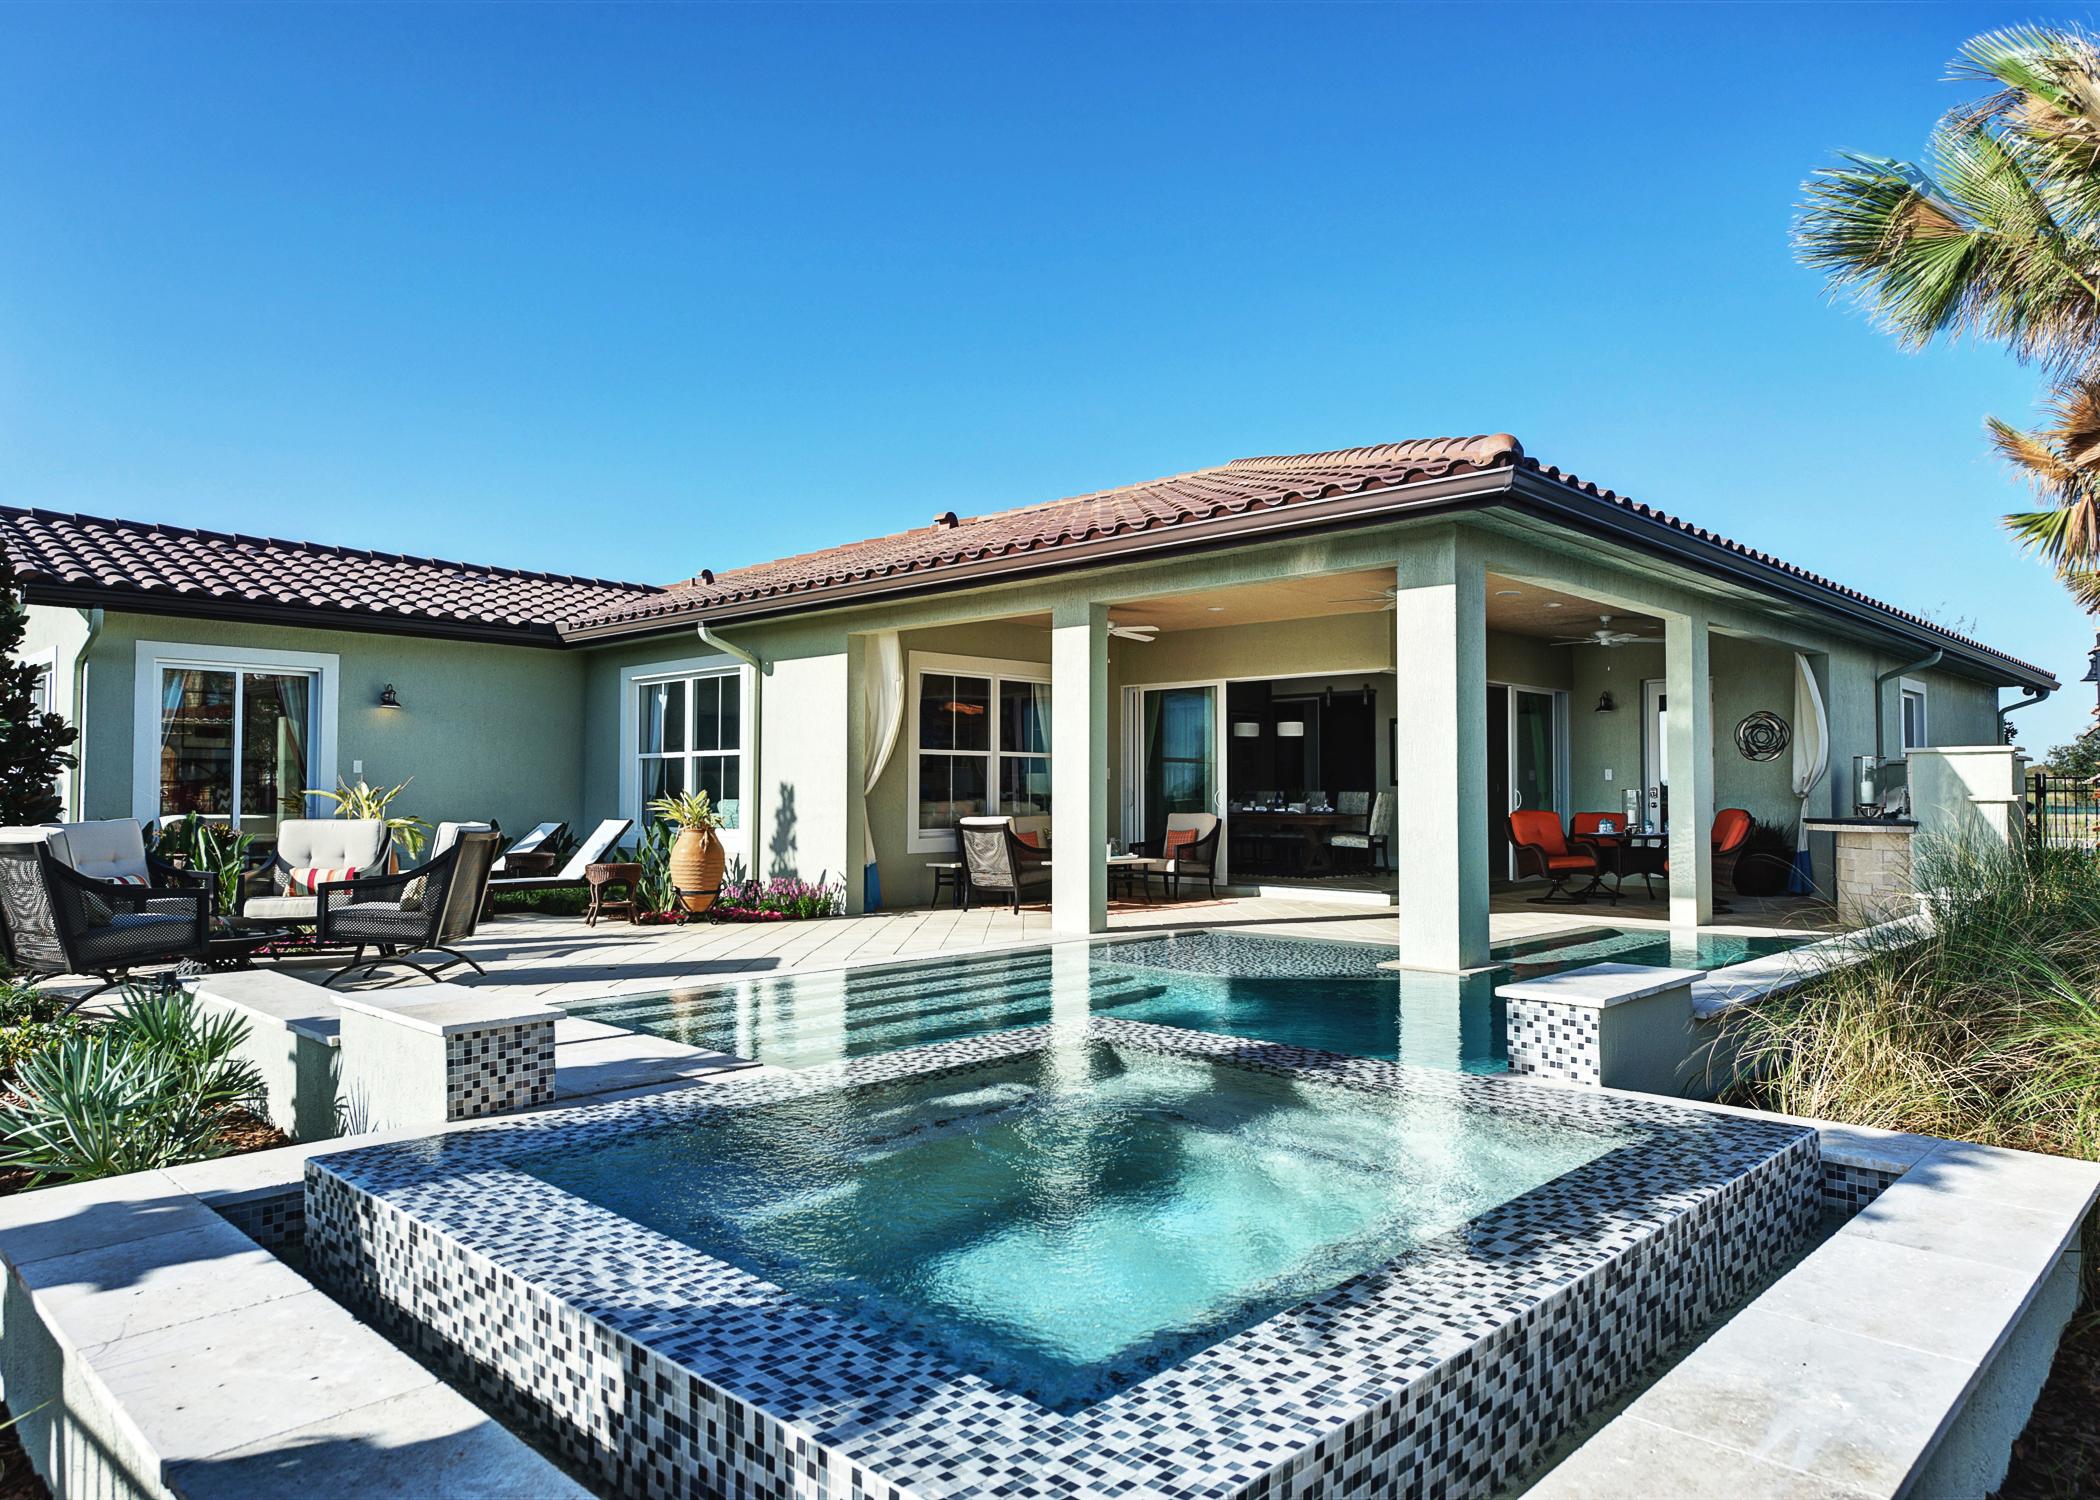 2011 Gen Y Builder Magazine Show Home   | Orlando, Florida    AWARDS  +  2012 Gold Nugget Award of Merit  for Best Single Family Detached Home Under 1,700-2,500 Sq. Ft.